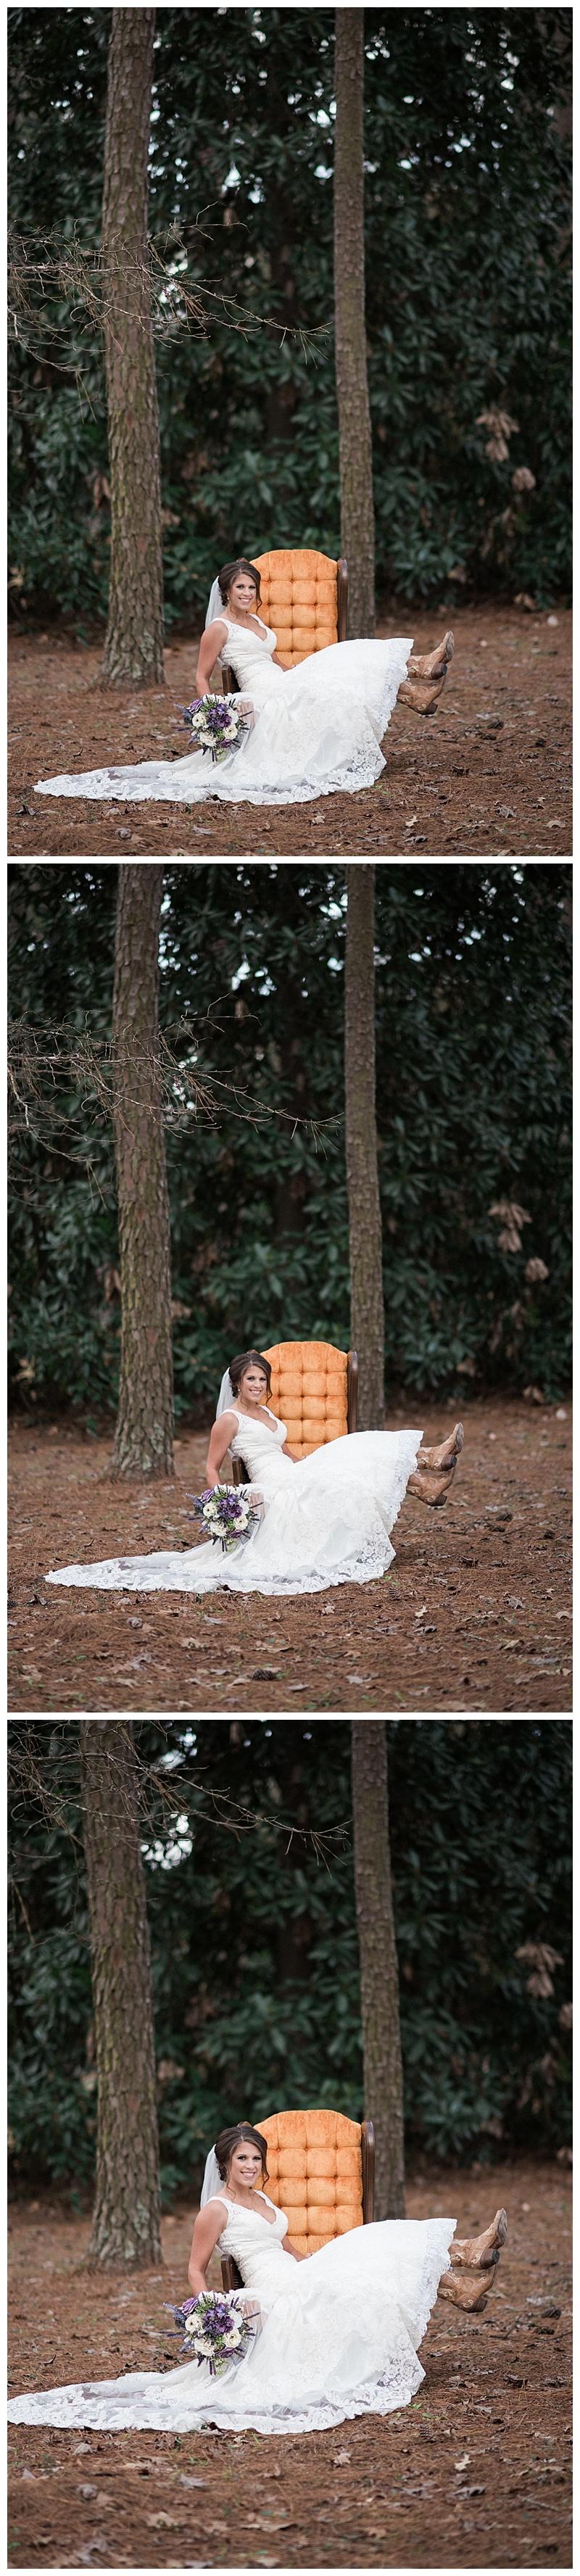 23Whitney Marie Photography. Shreveport Wedding Photographer. American rose center bridals.jpg